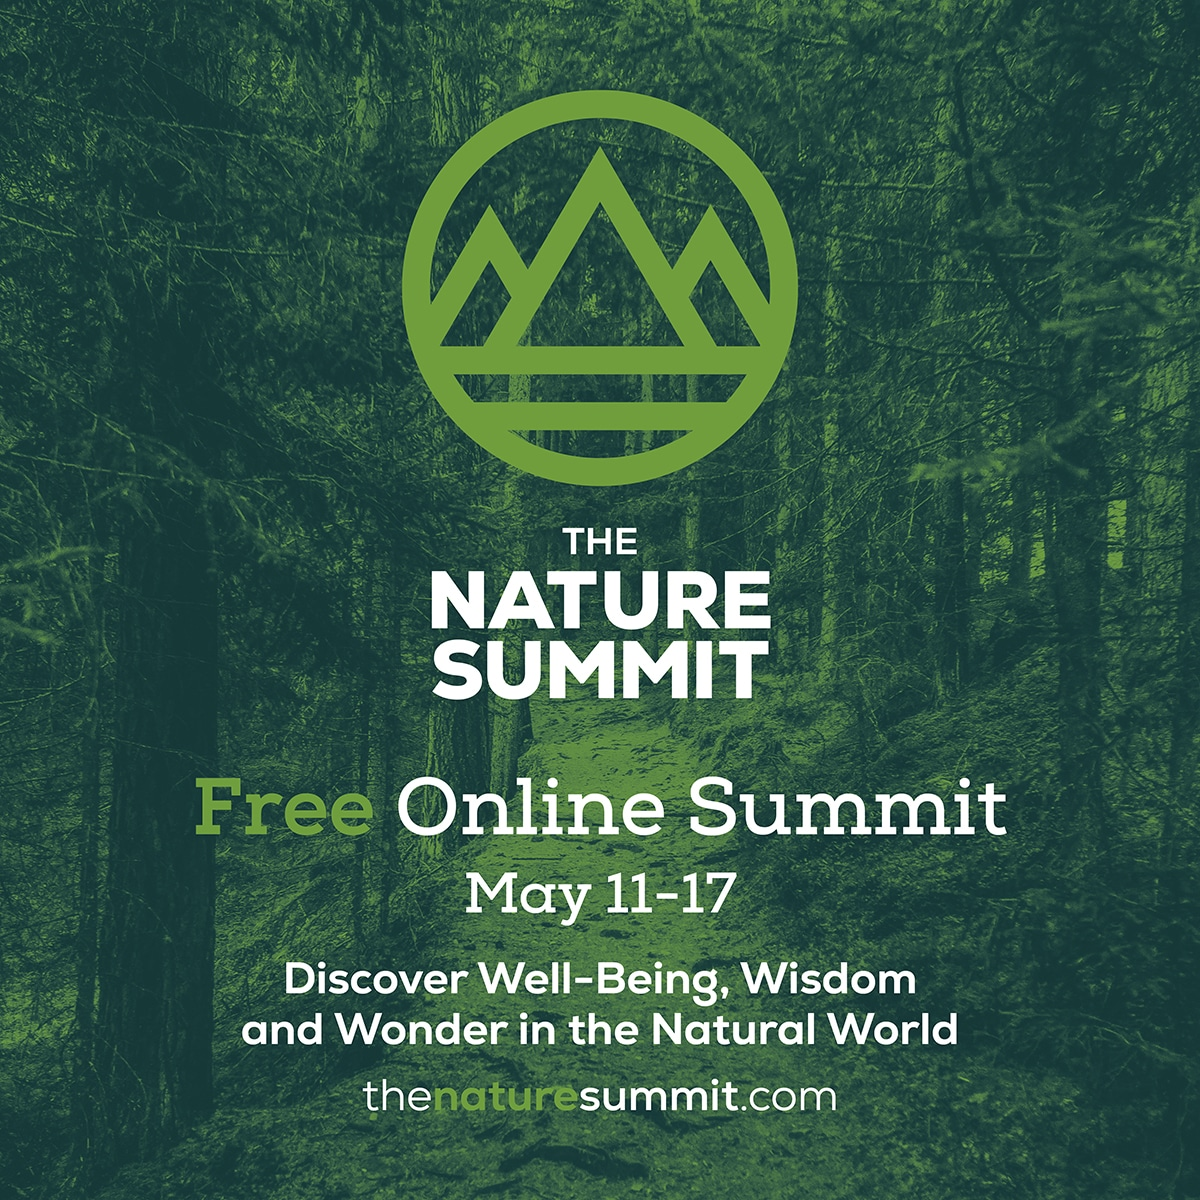 The Nature Summit